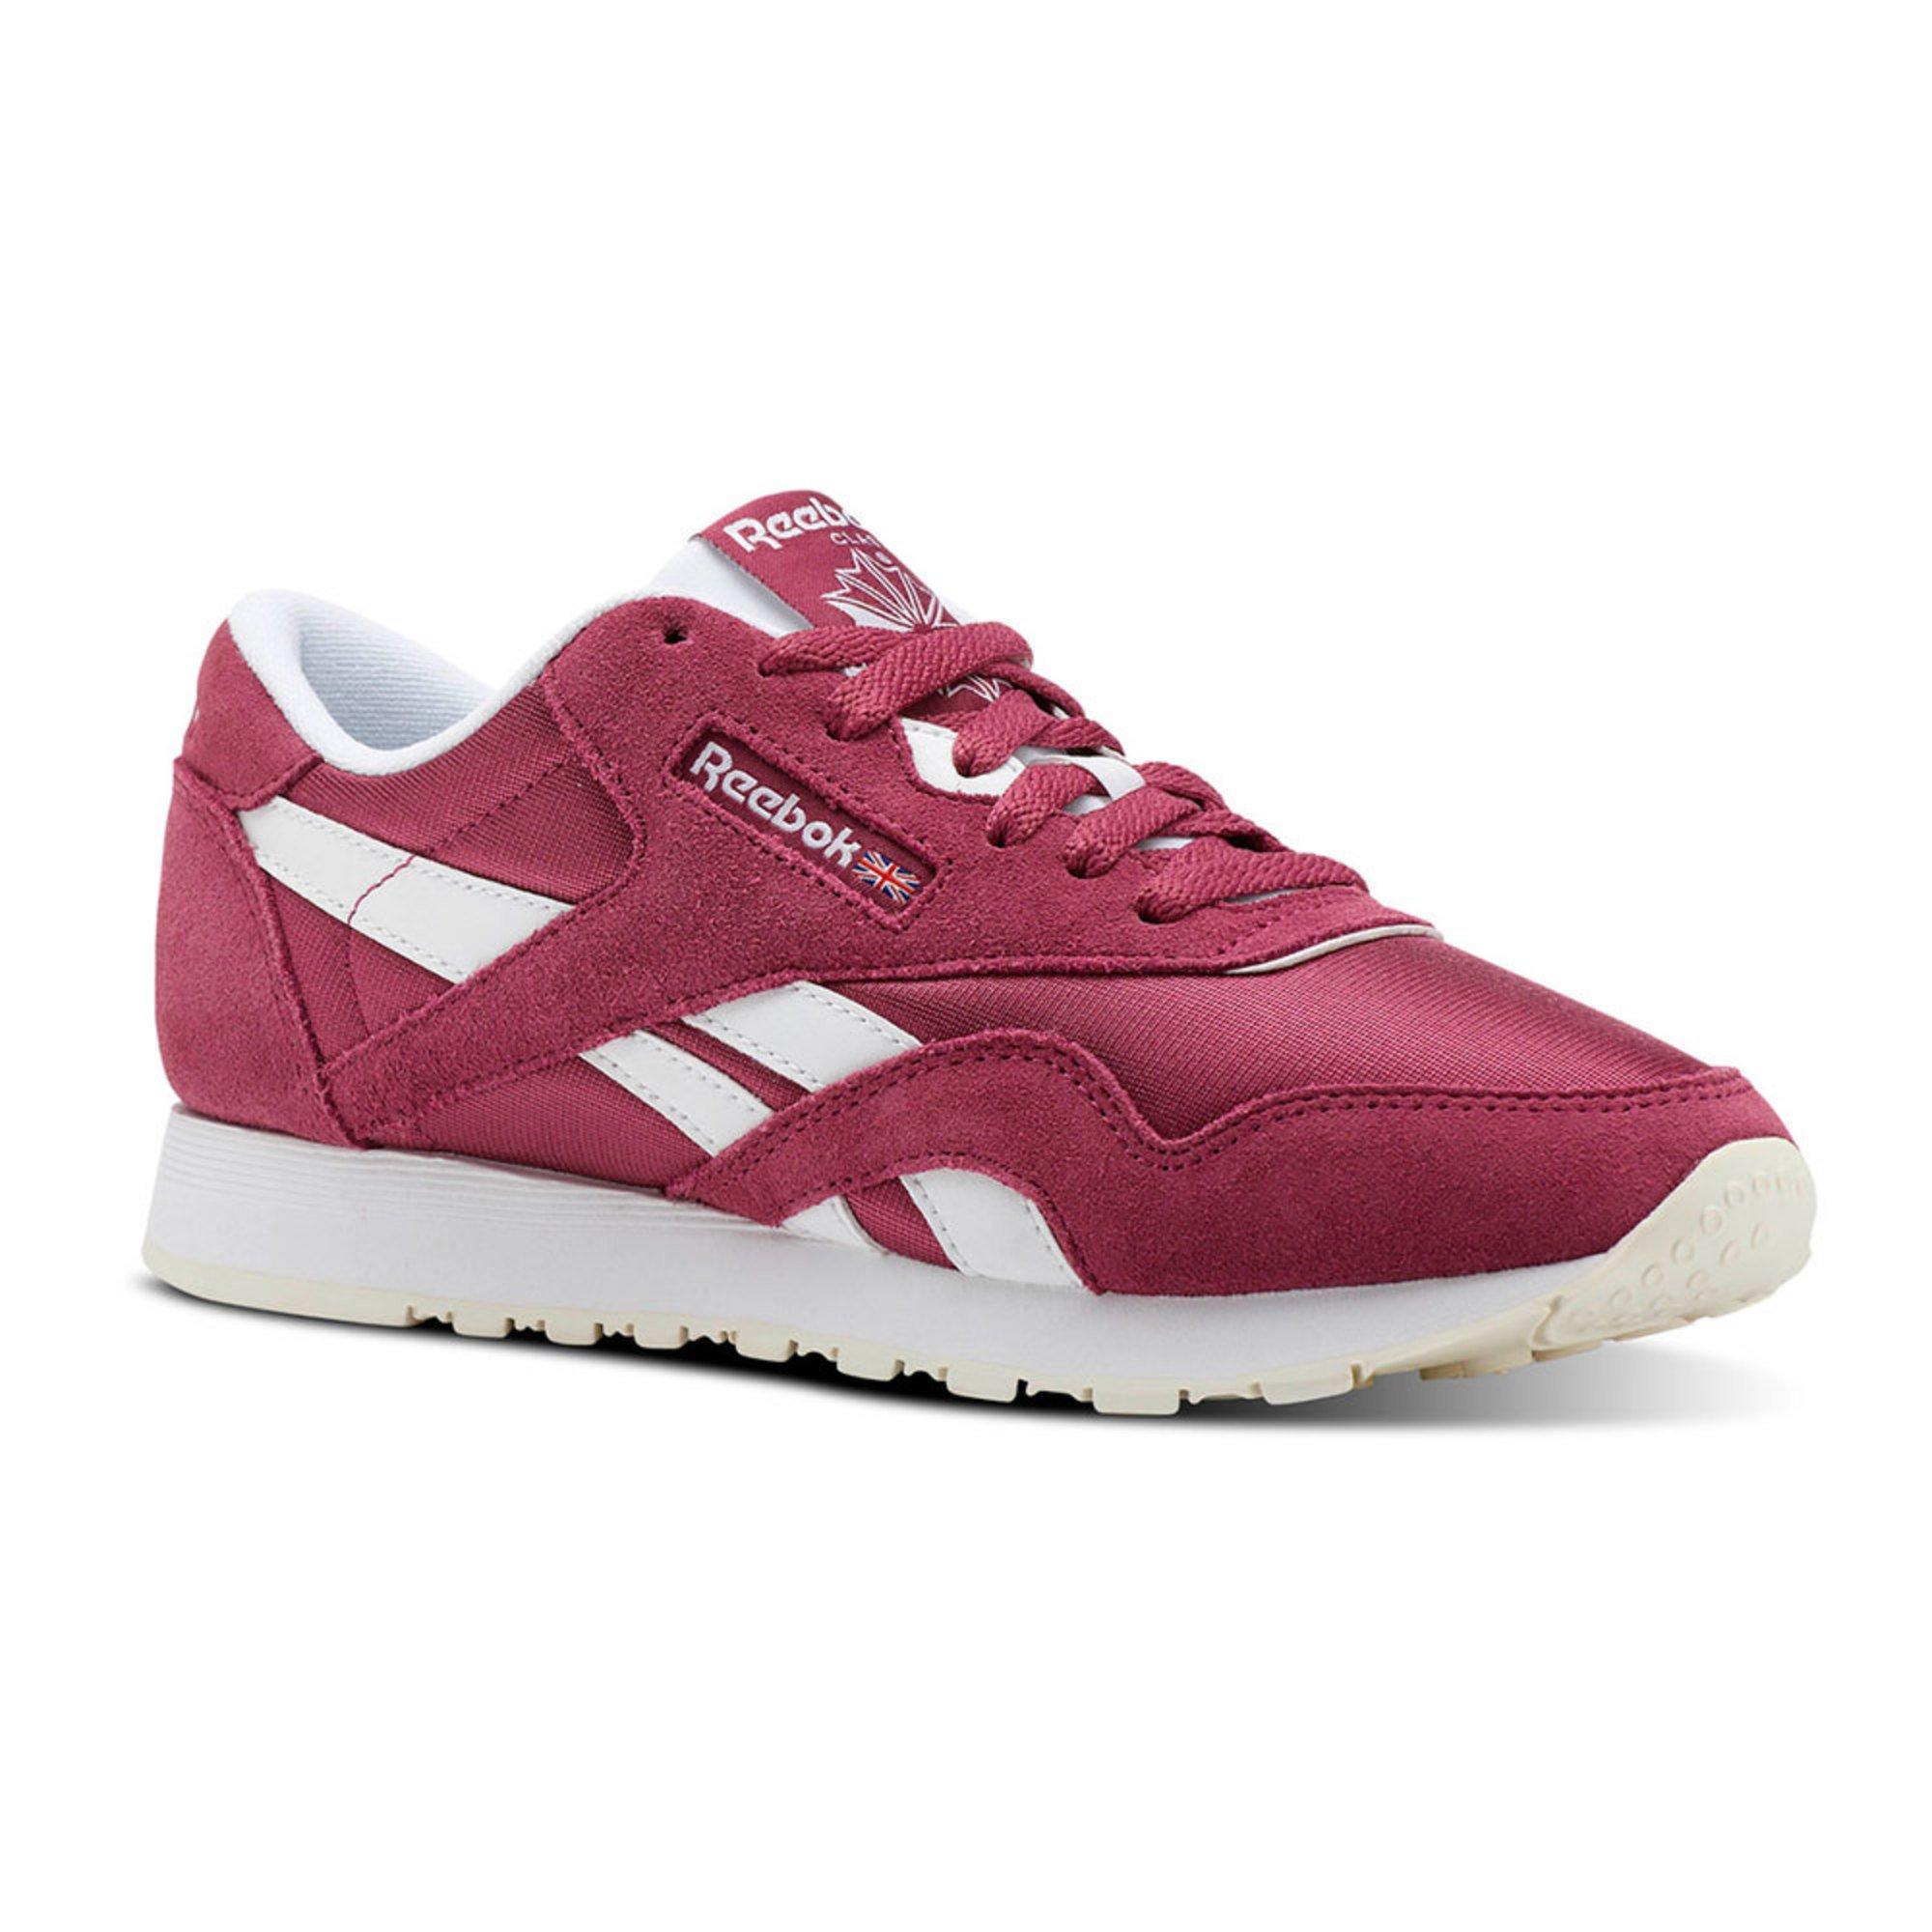 65a2781aa1d3 Reebok Women s Classic Nylon Lifestyle Running Shoe